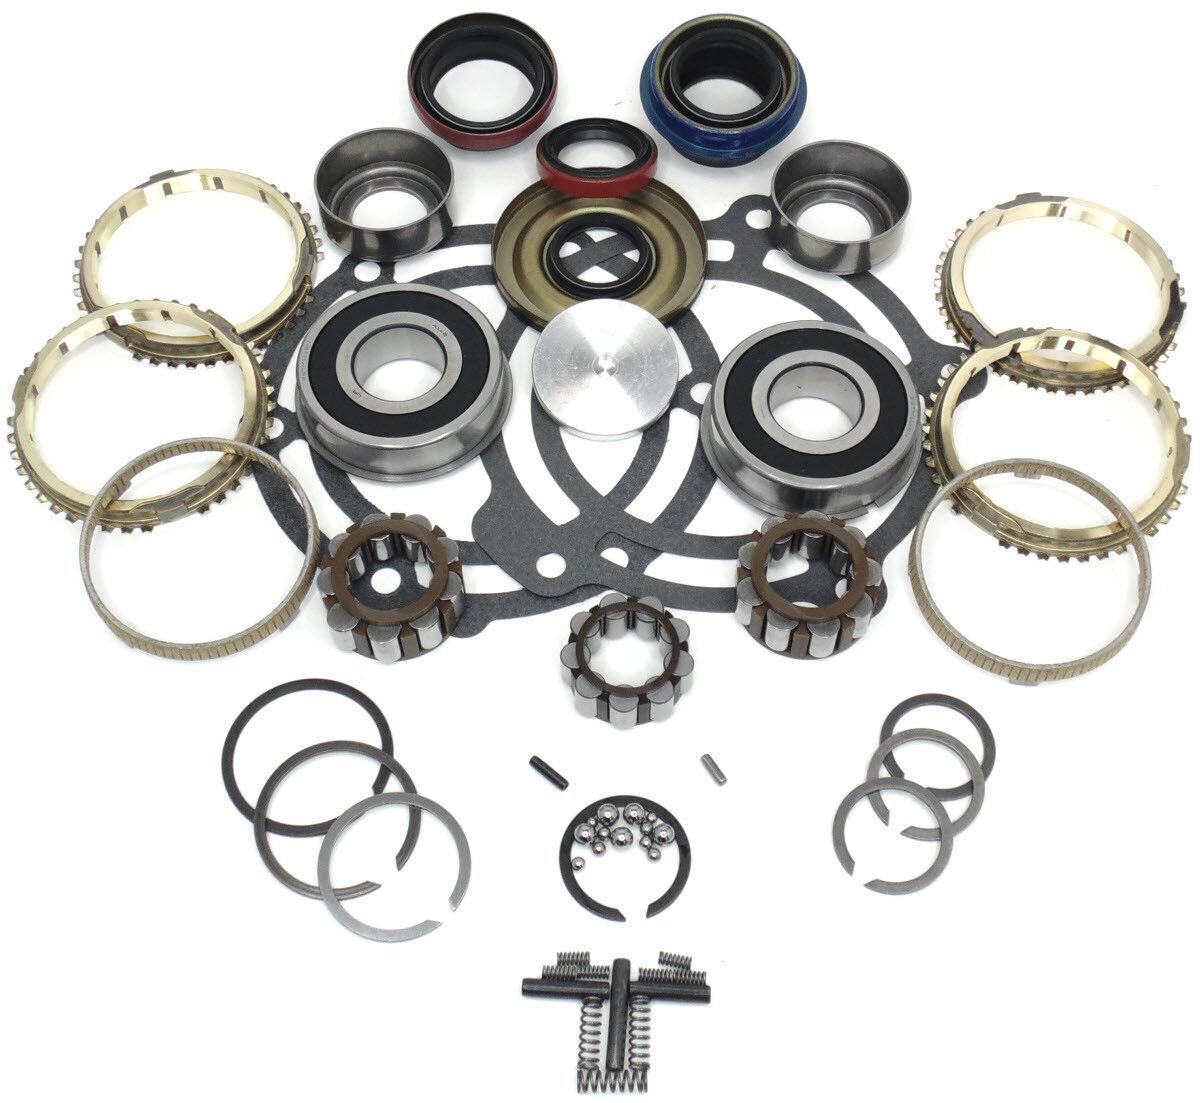 Getrag NV3500 NV3550 Chevy Jeep Dodge 5 Speed Trans Rebuild Bearing Kit  BK235GWS | Shopping Bin - Search eBay faster